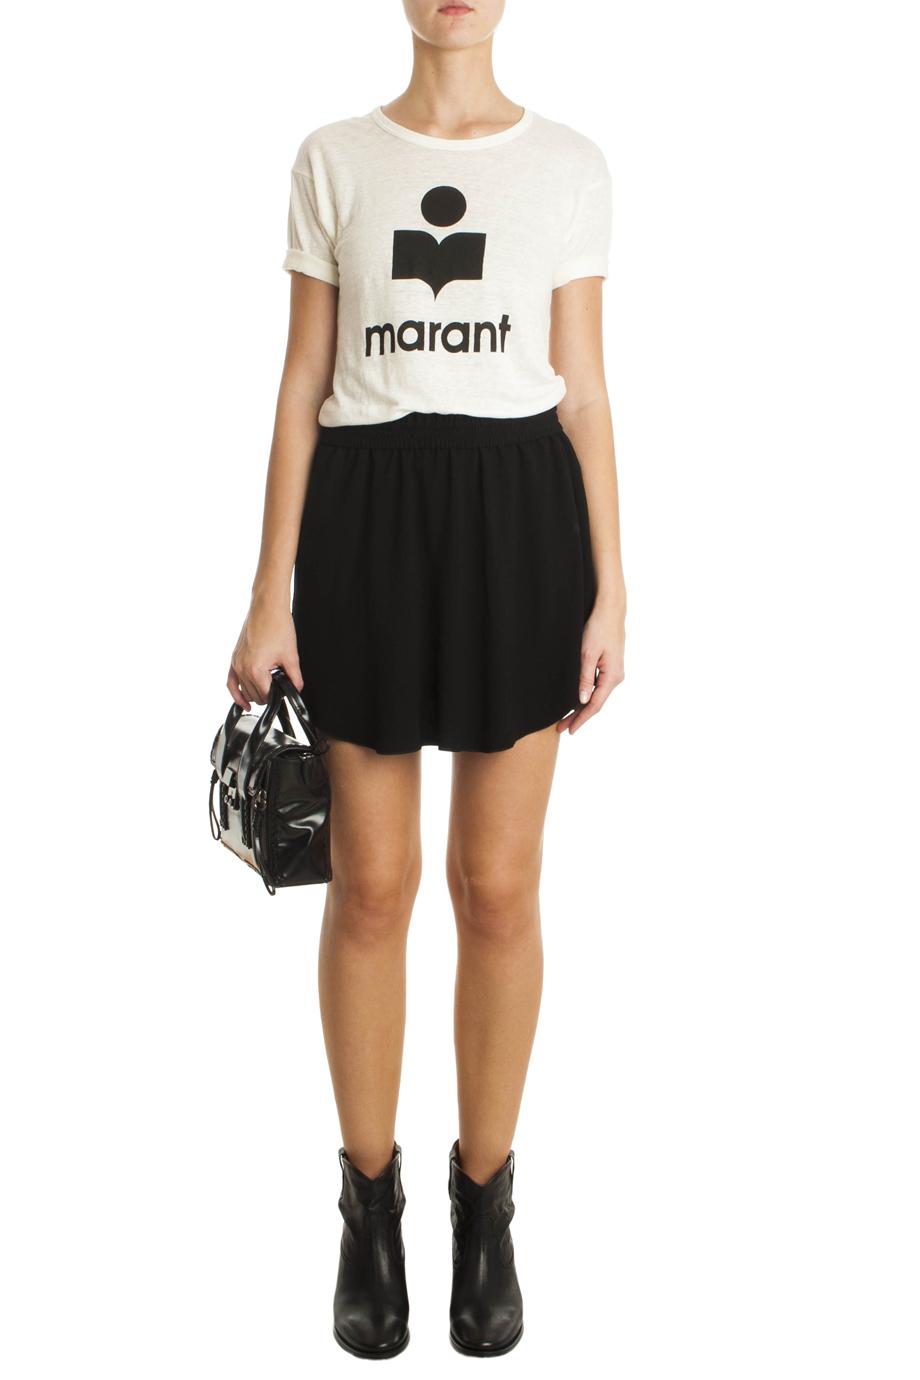 lyst toile isabel marant koldi marant t shirt in white